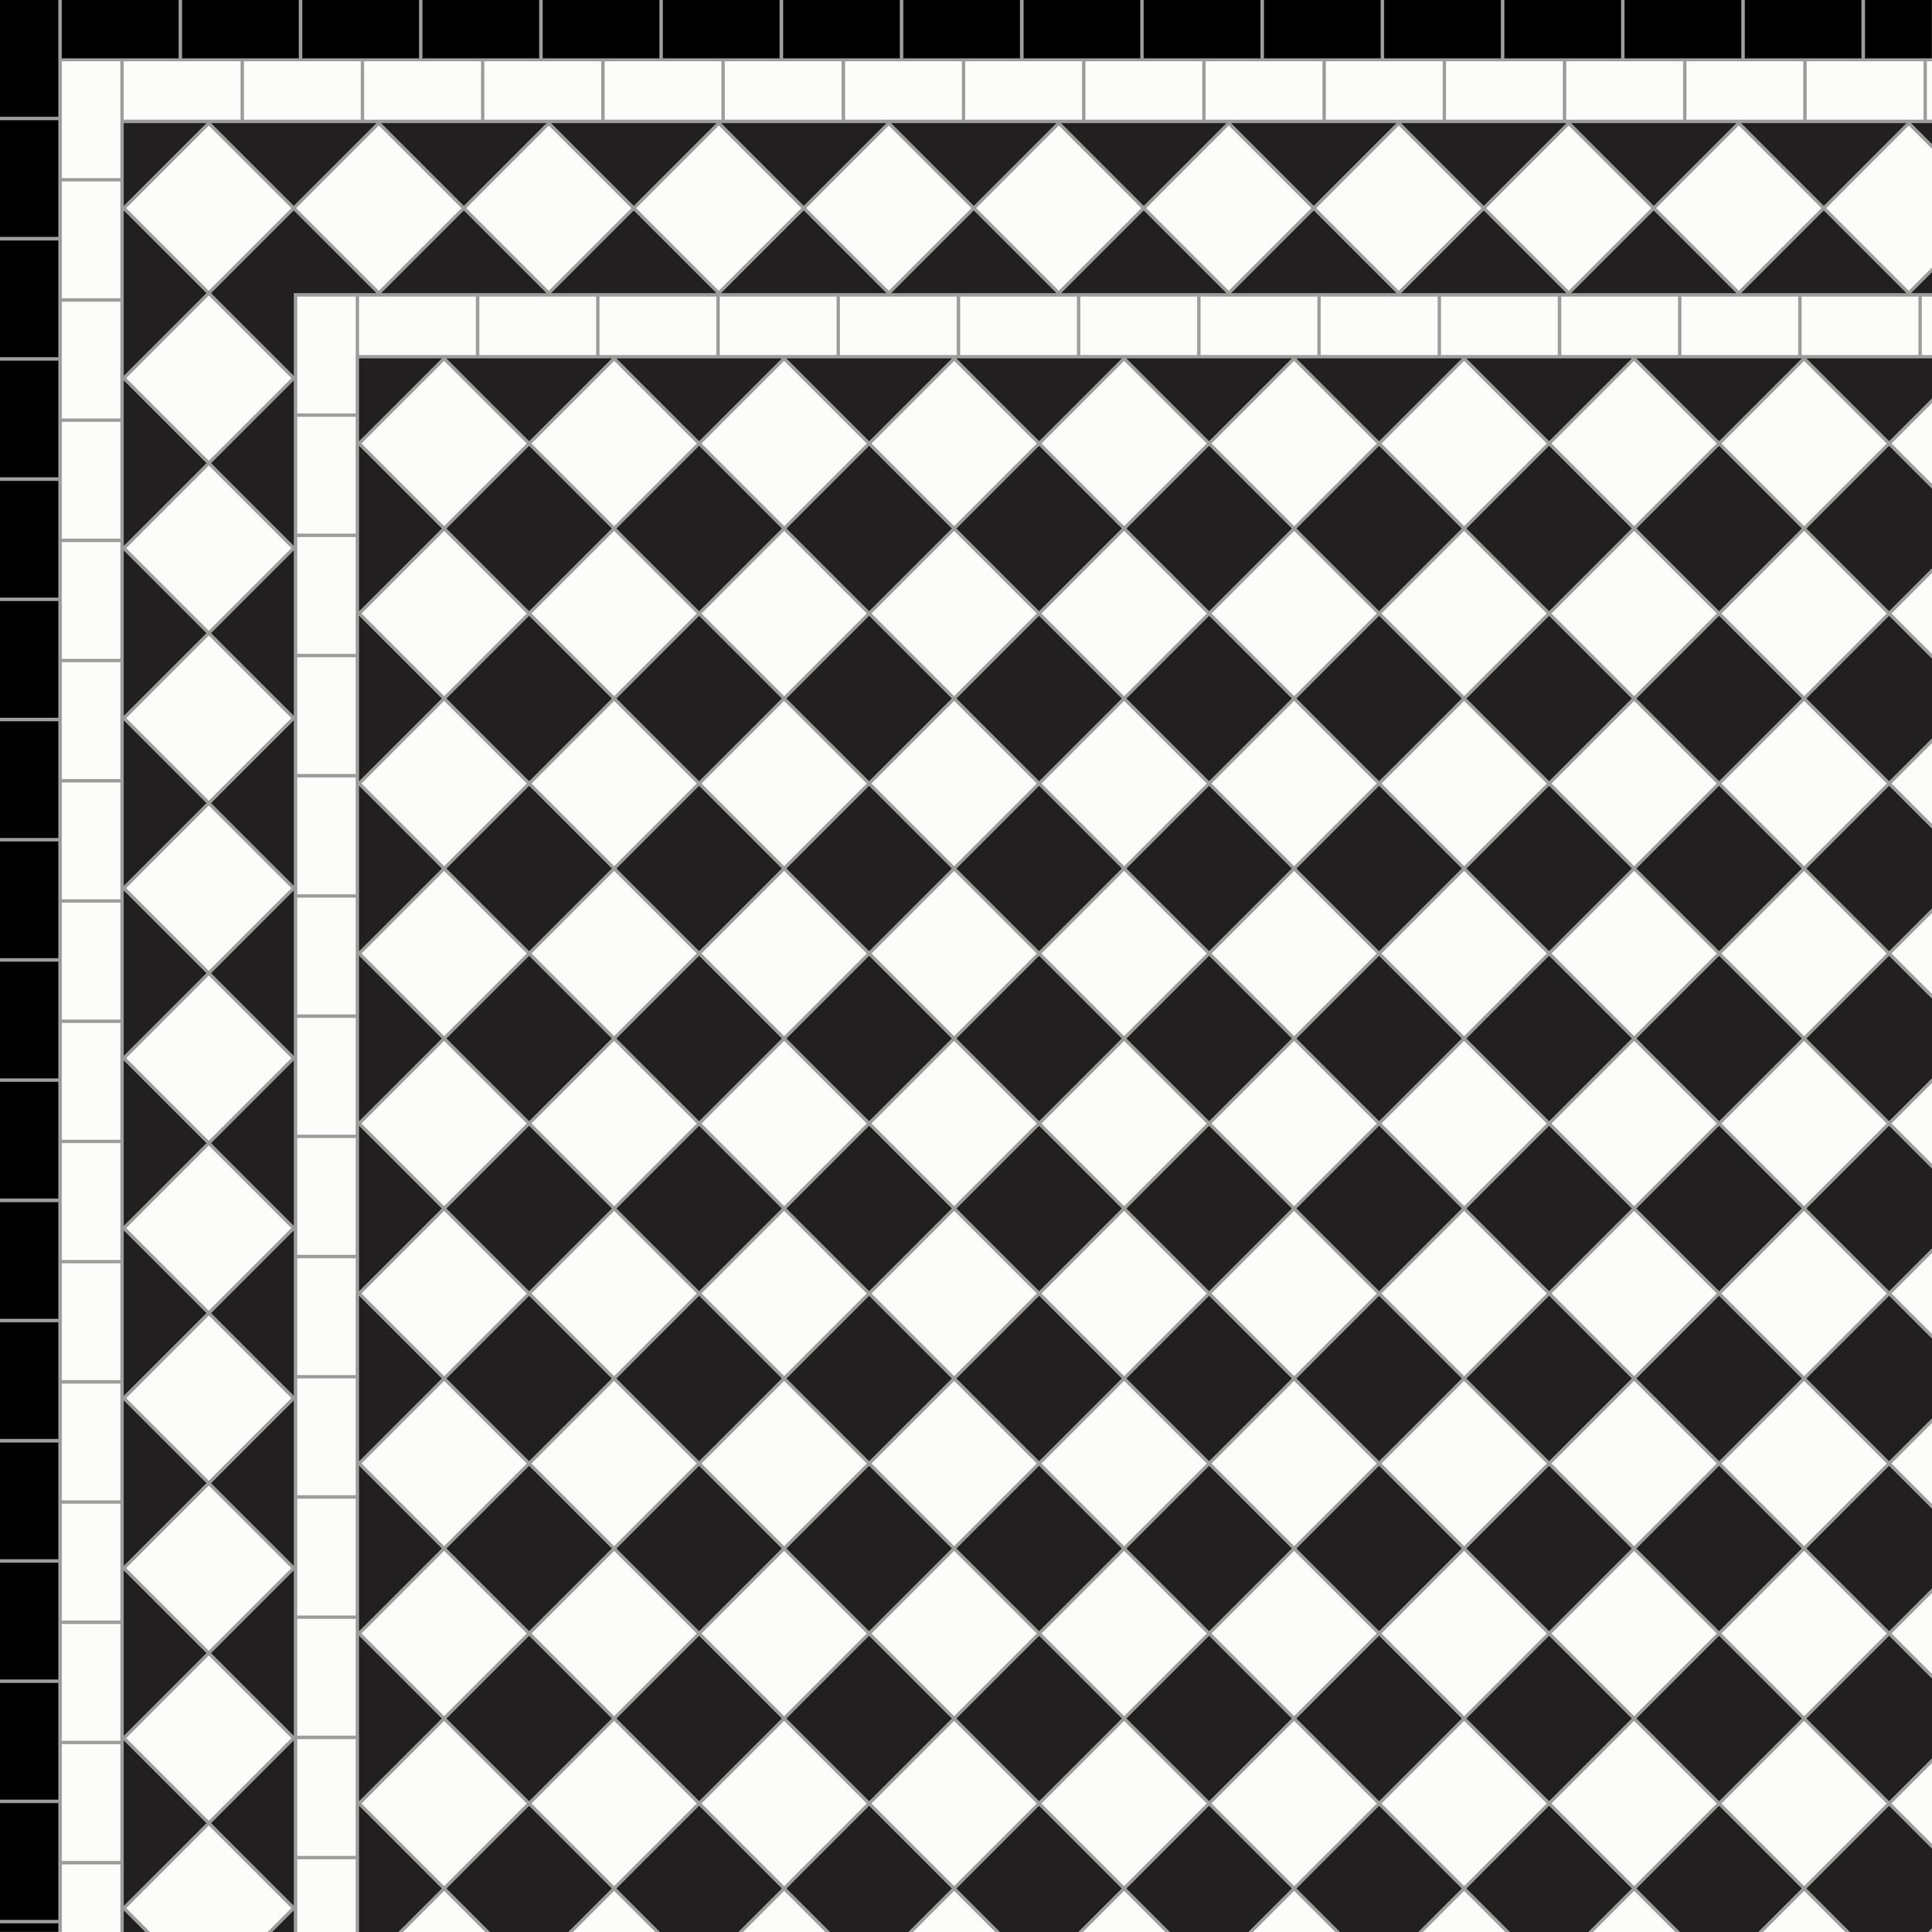 Chequer - White Diamond Border 3 Lines